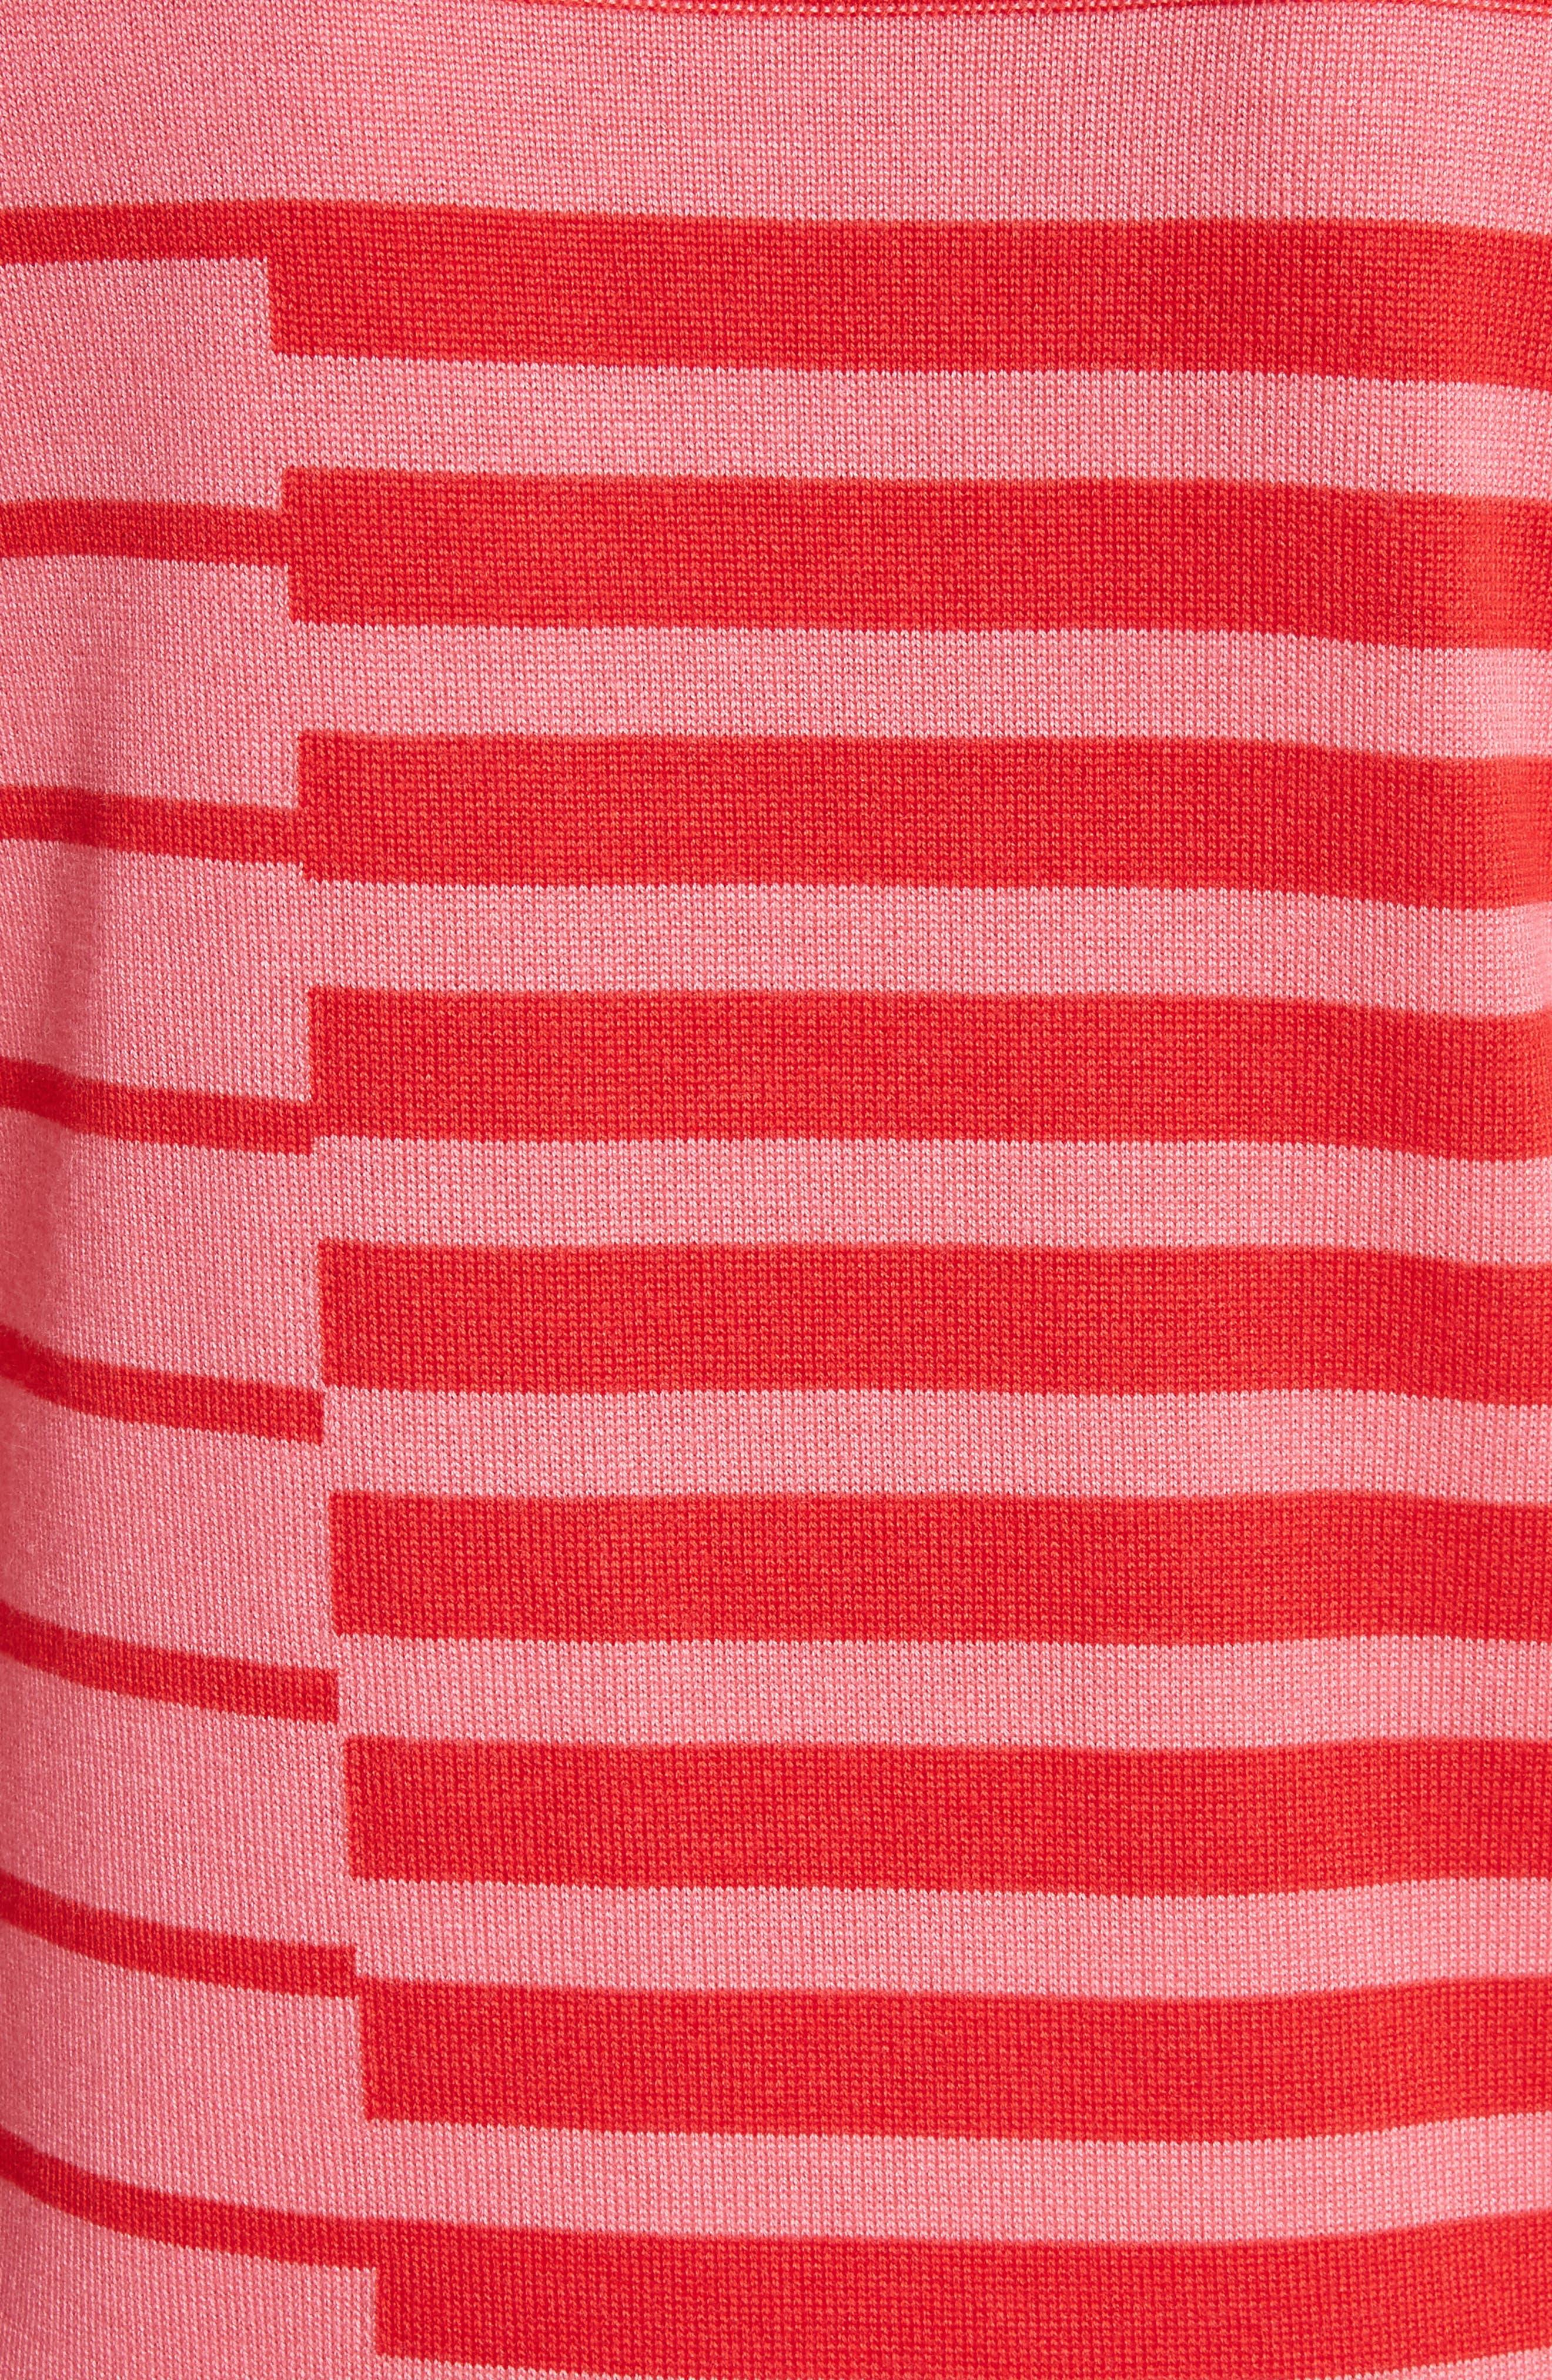 Intarsia Stripe Sweater,                             Alternate thumbnail 5, color,                             660